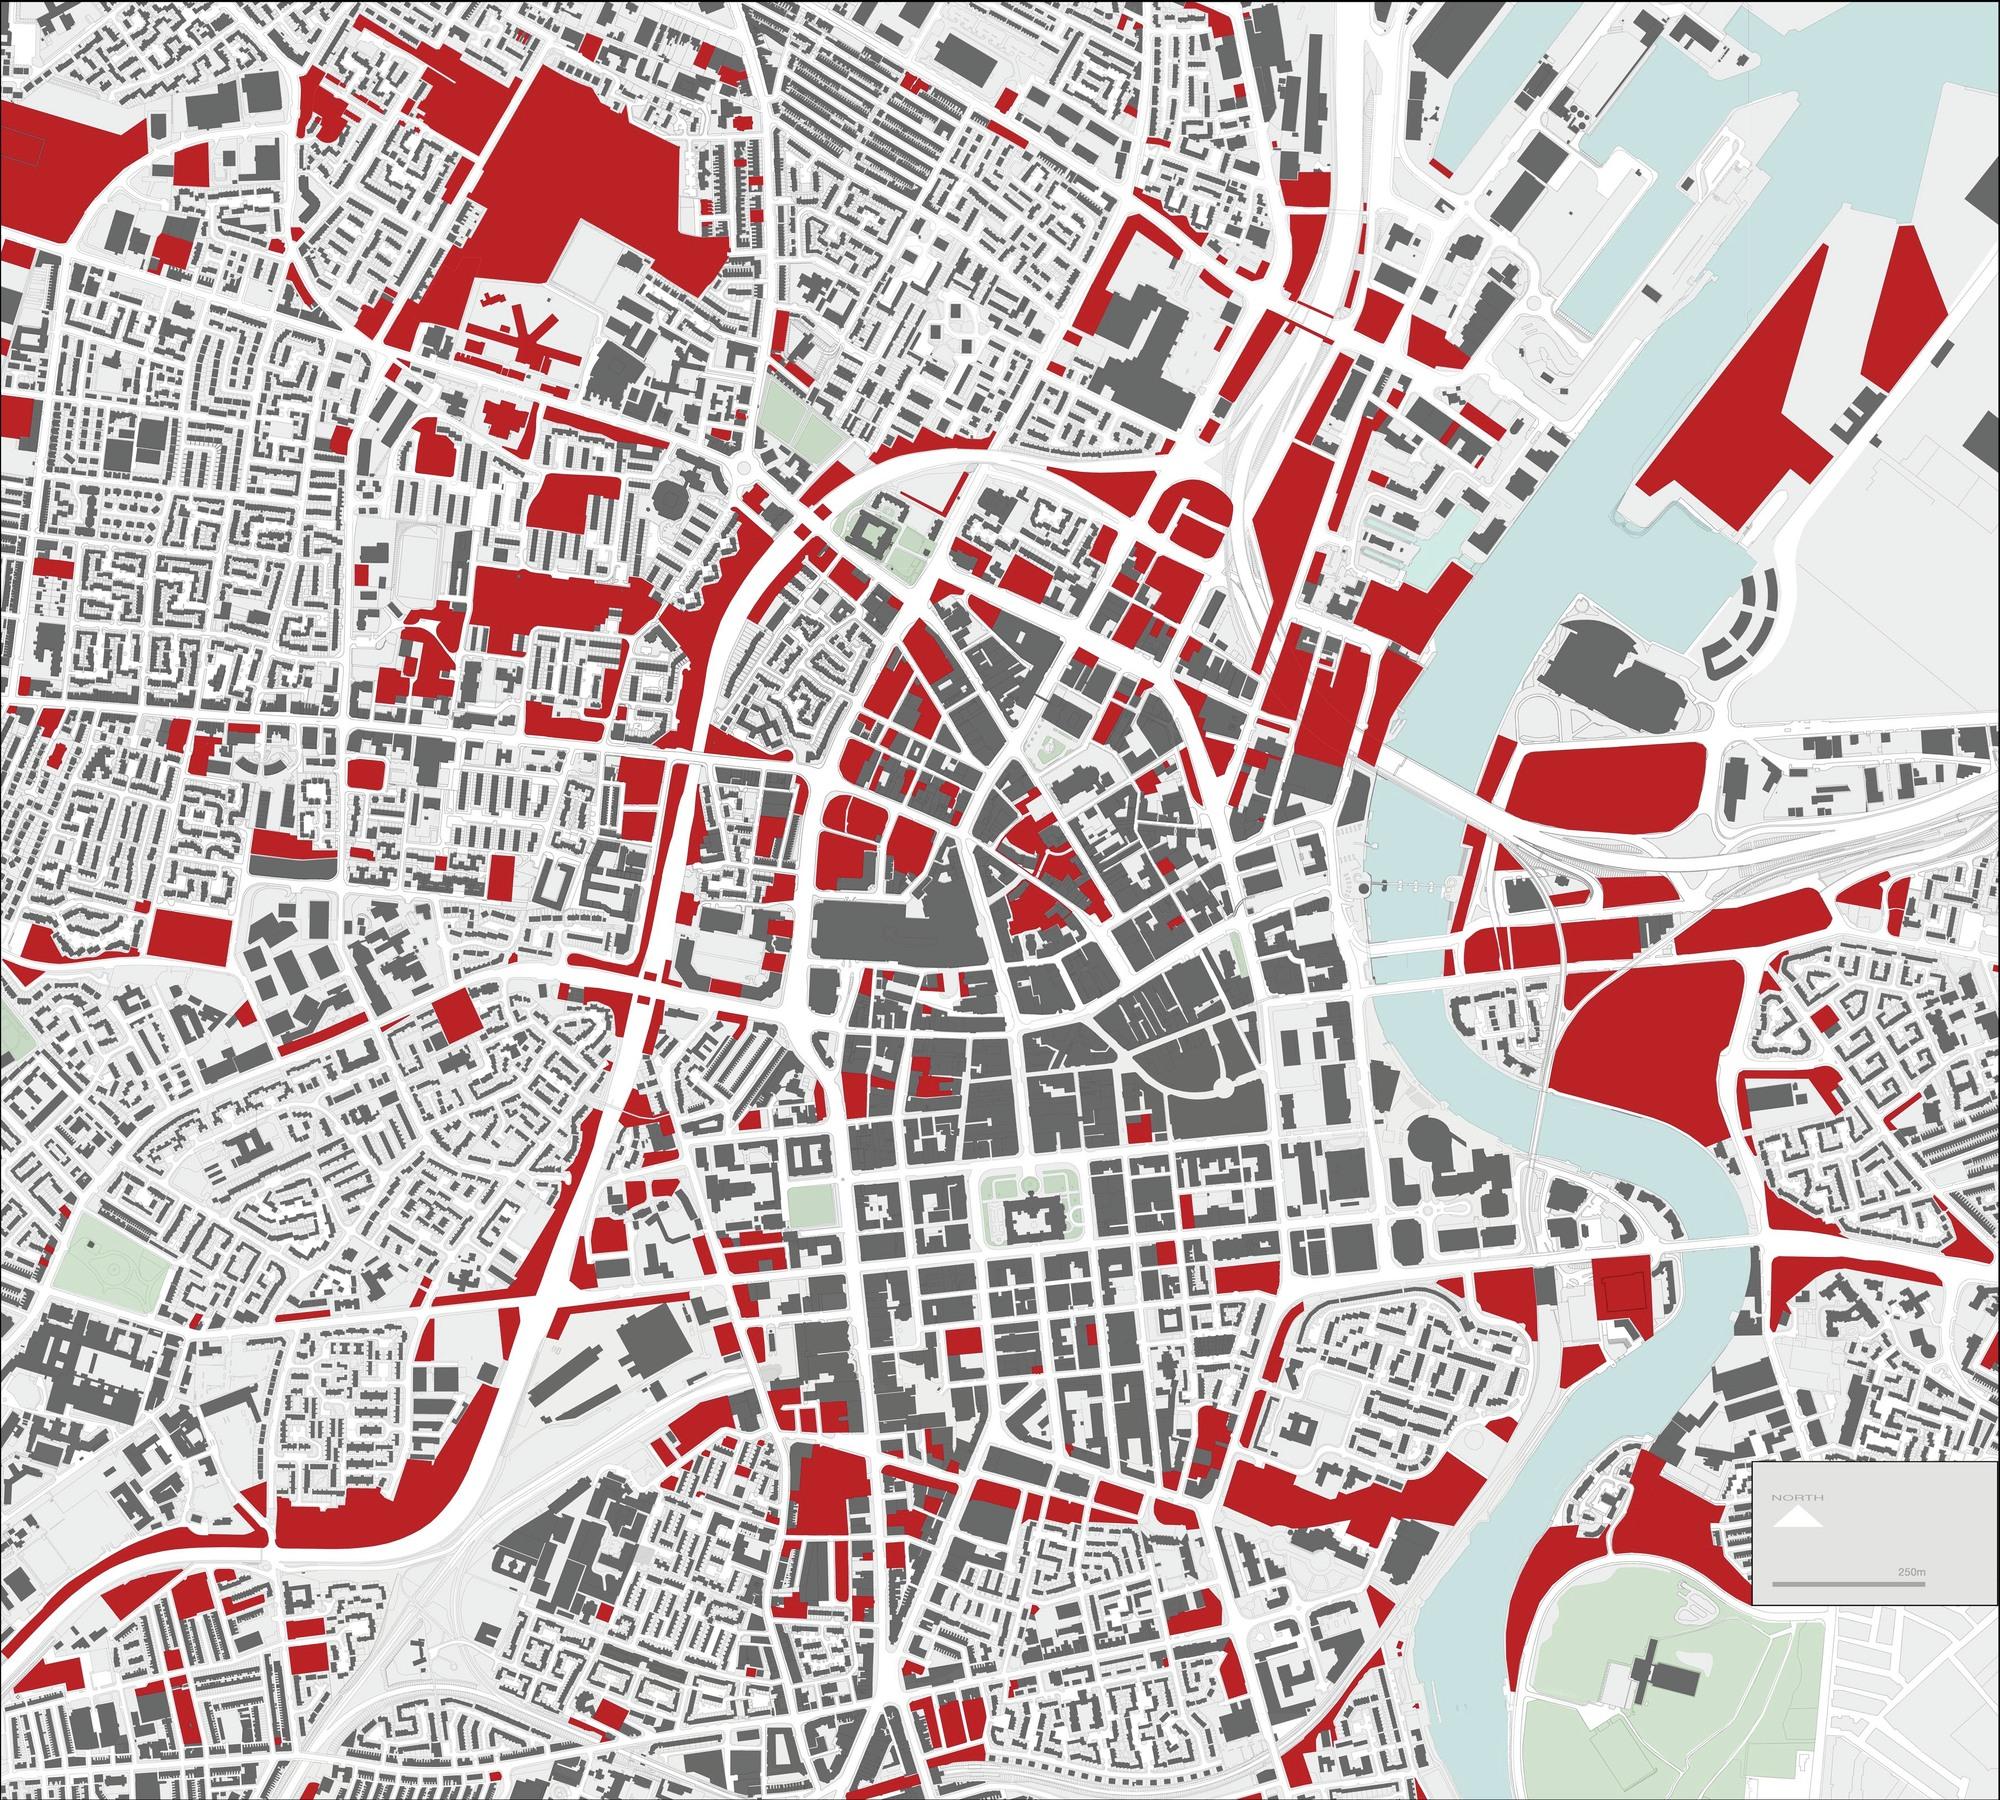 Gallery Of Venice Biennale British Pavilion Presents Venice - Venice biennale 2016 map